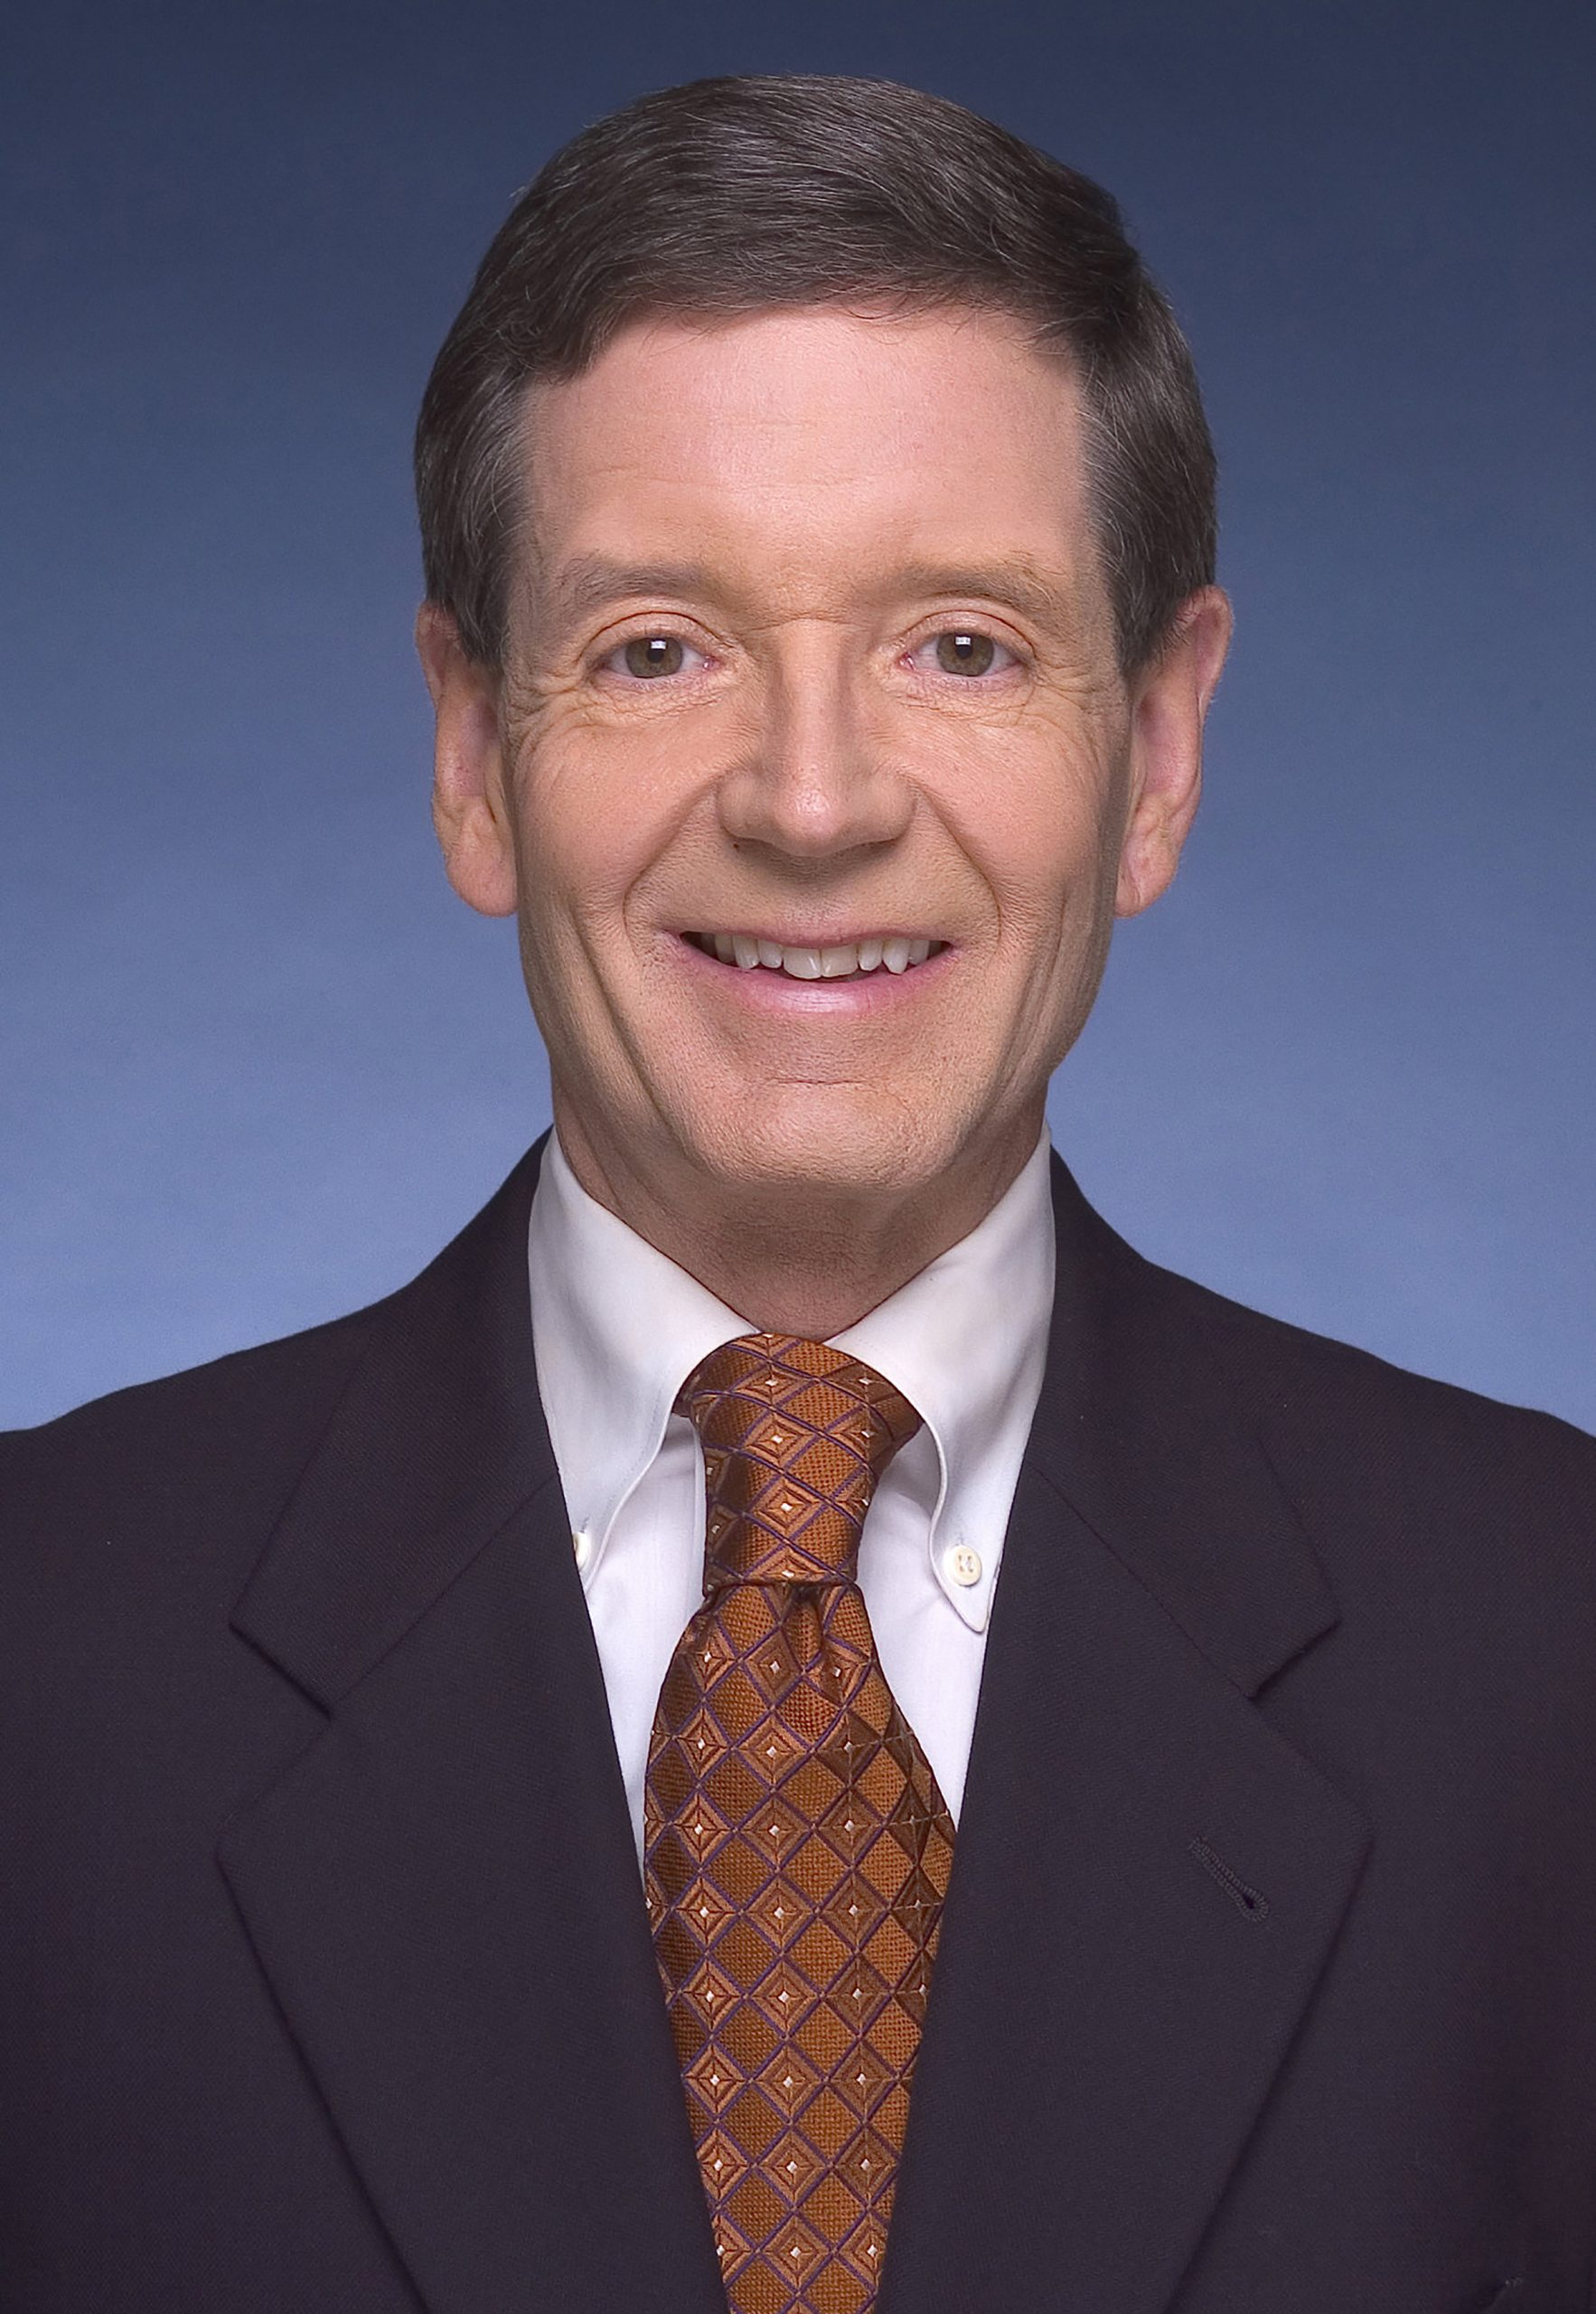 Allan Landon